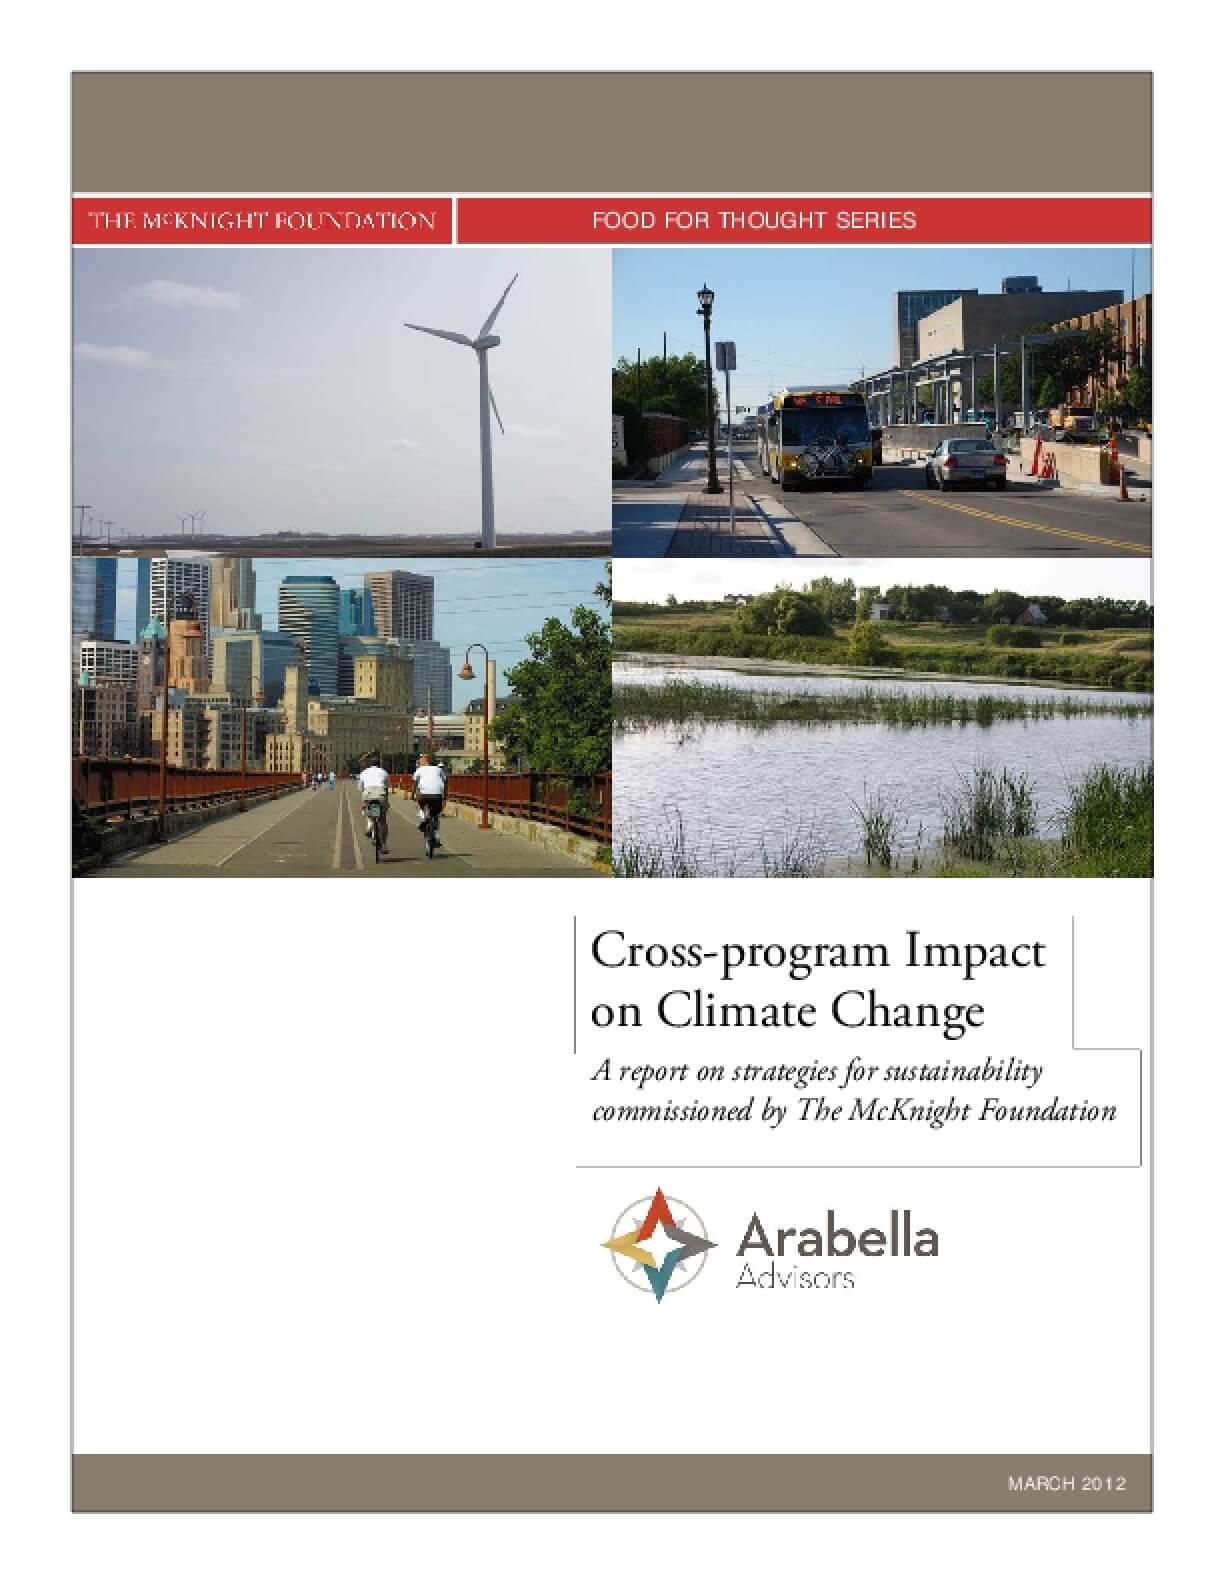 Cross-program Impact on Climate Change